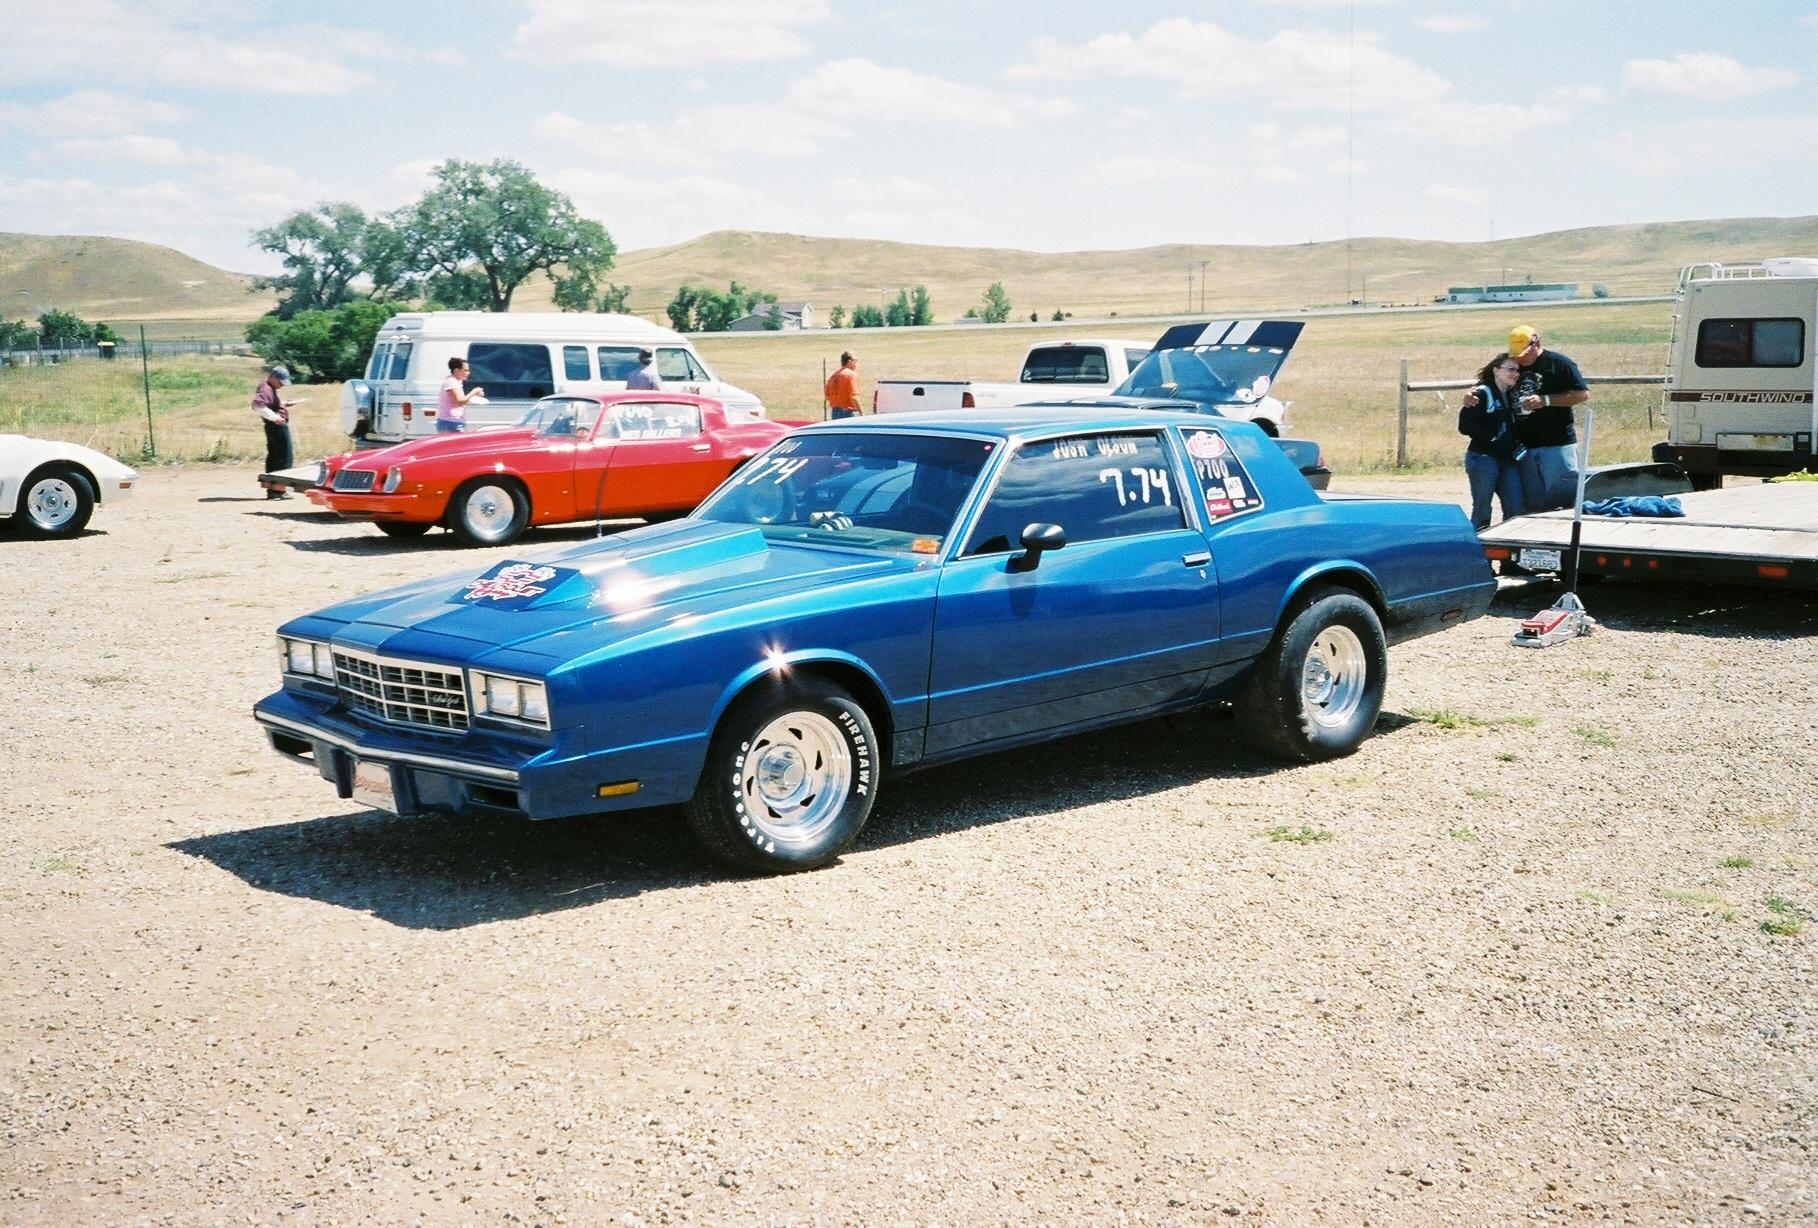 1985 Chevrolet Monte Carlo 1/8 mile Drag Racing timeslip 0-60 ...